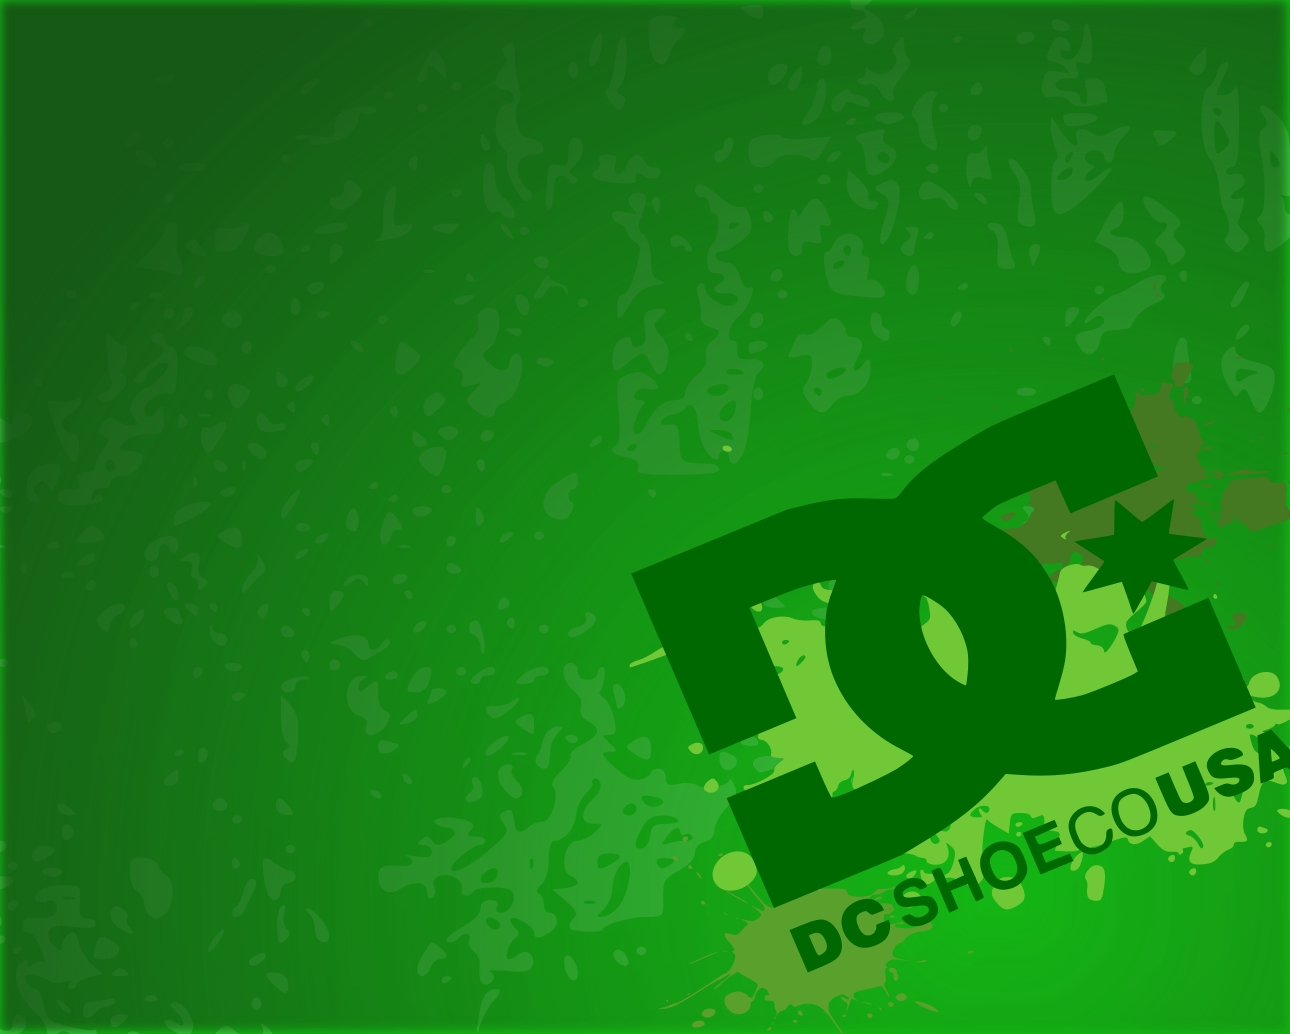 Dc shoes logo wallpaper HD   Imagui 1290x1034